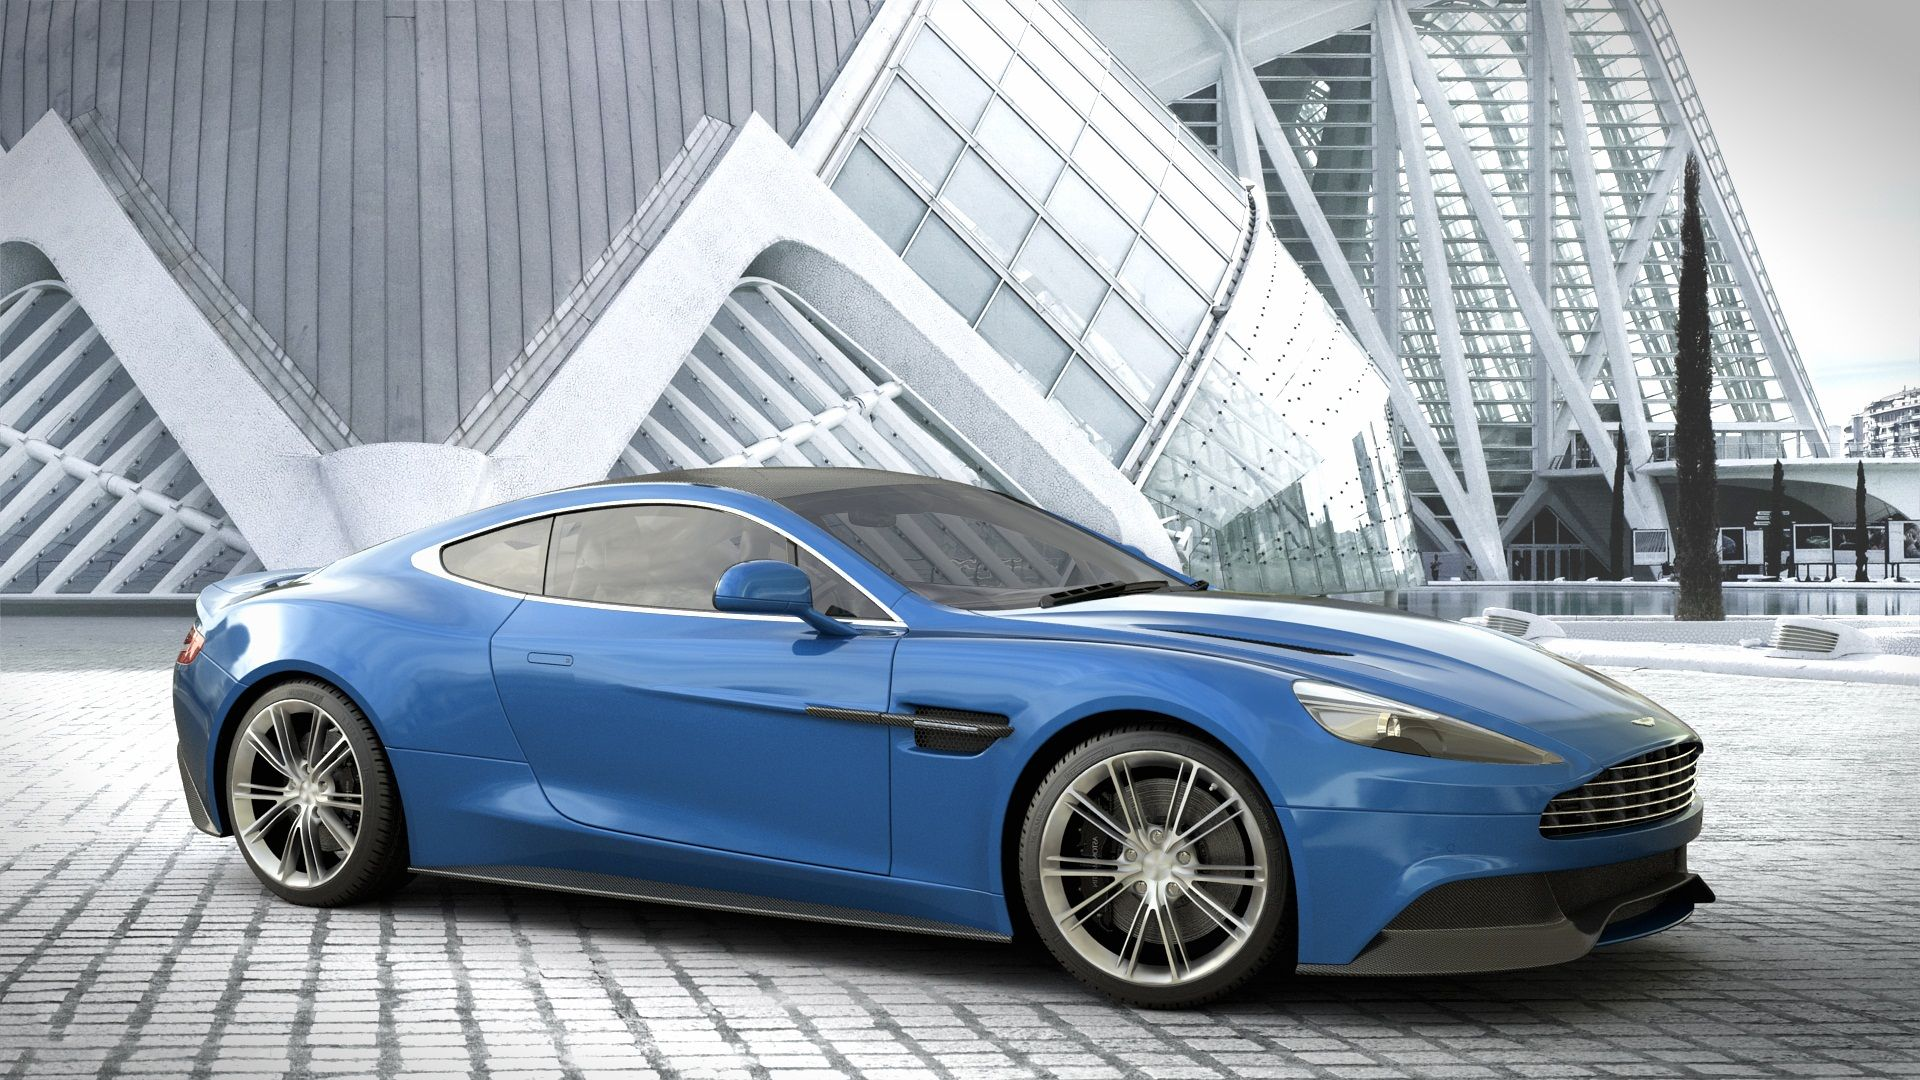 2015 Aston Martin Vanquish Hd Wallpaper 2015astonmartinvanquish Hdwallpaper Astonmarti Aston Martin Vanquish Aston Martin Vantage Aston Martin Dbs Volante